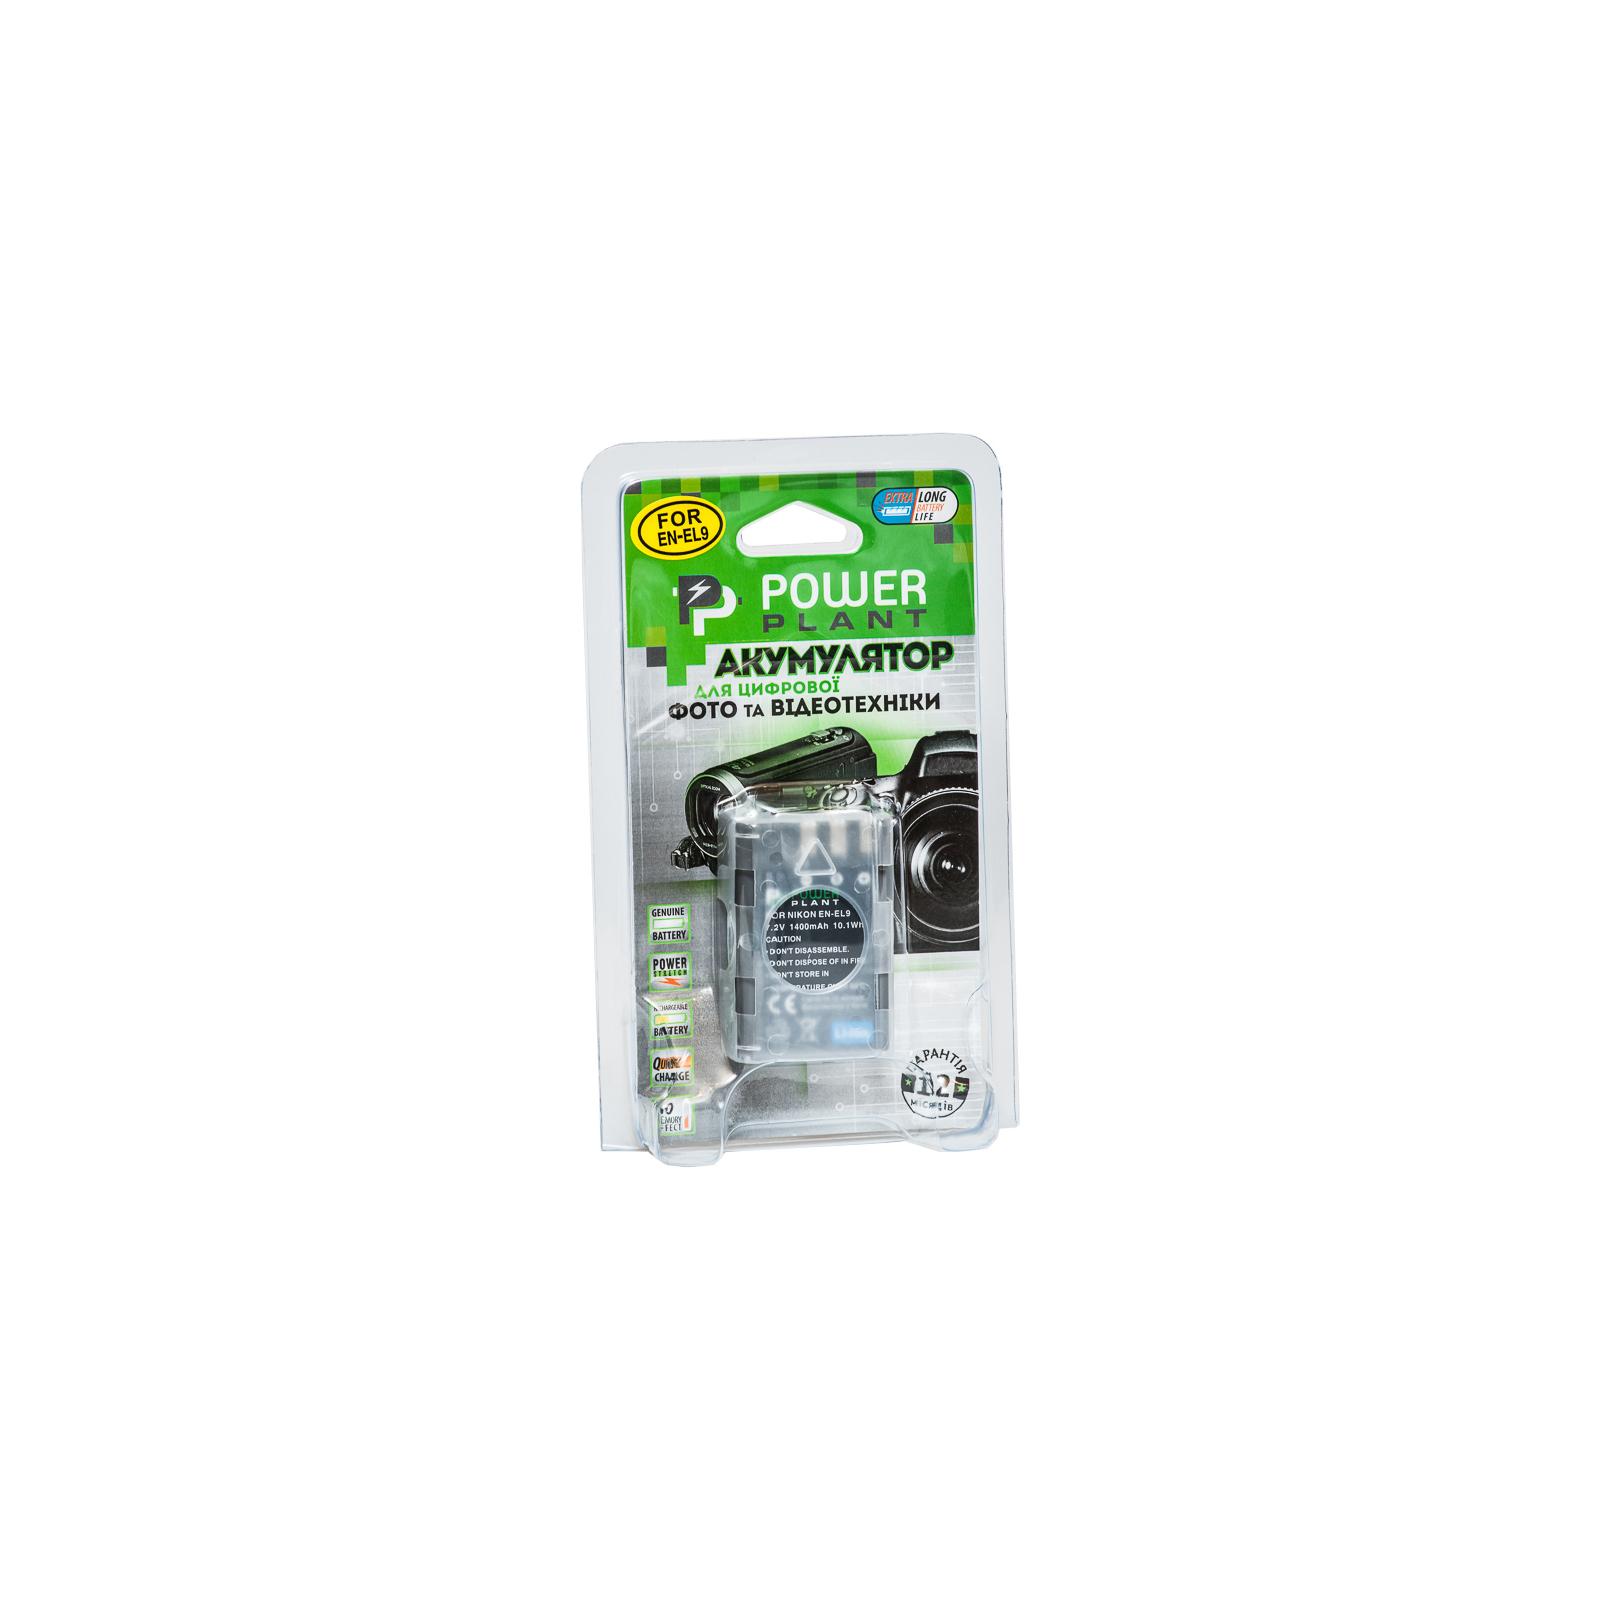 Аккумулятор к фото/видео Nikon EN-EL9 PowerPlant (DV00DV1173) изображение 3